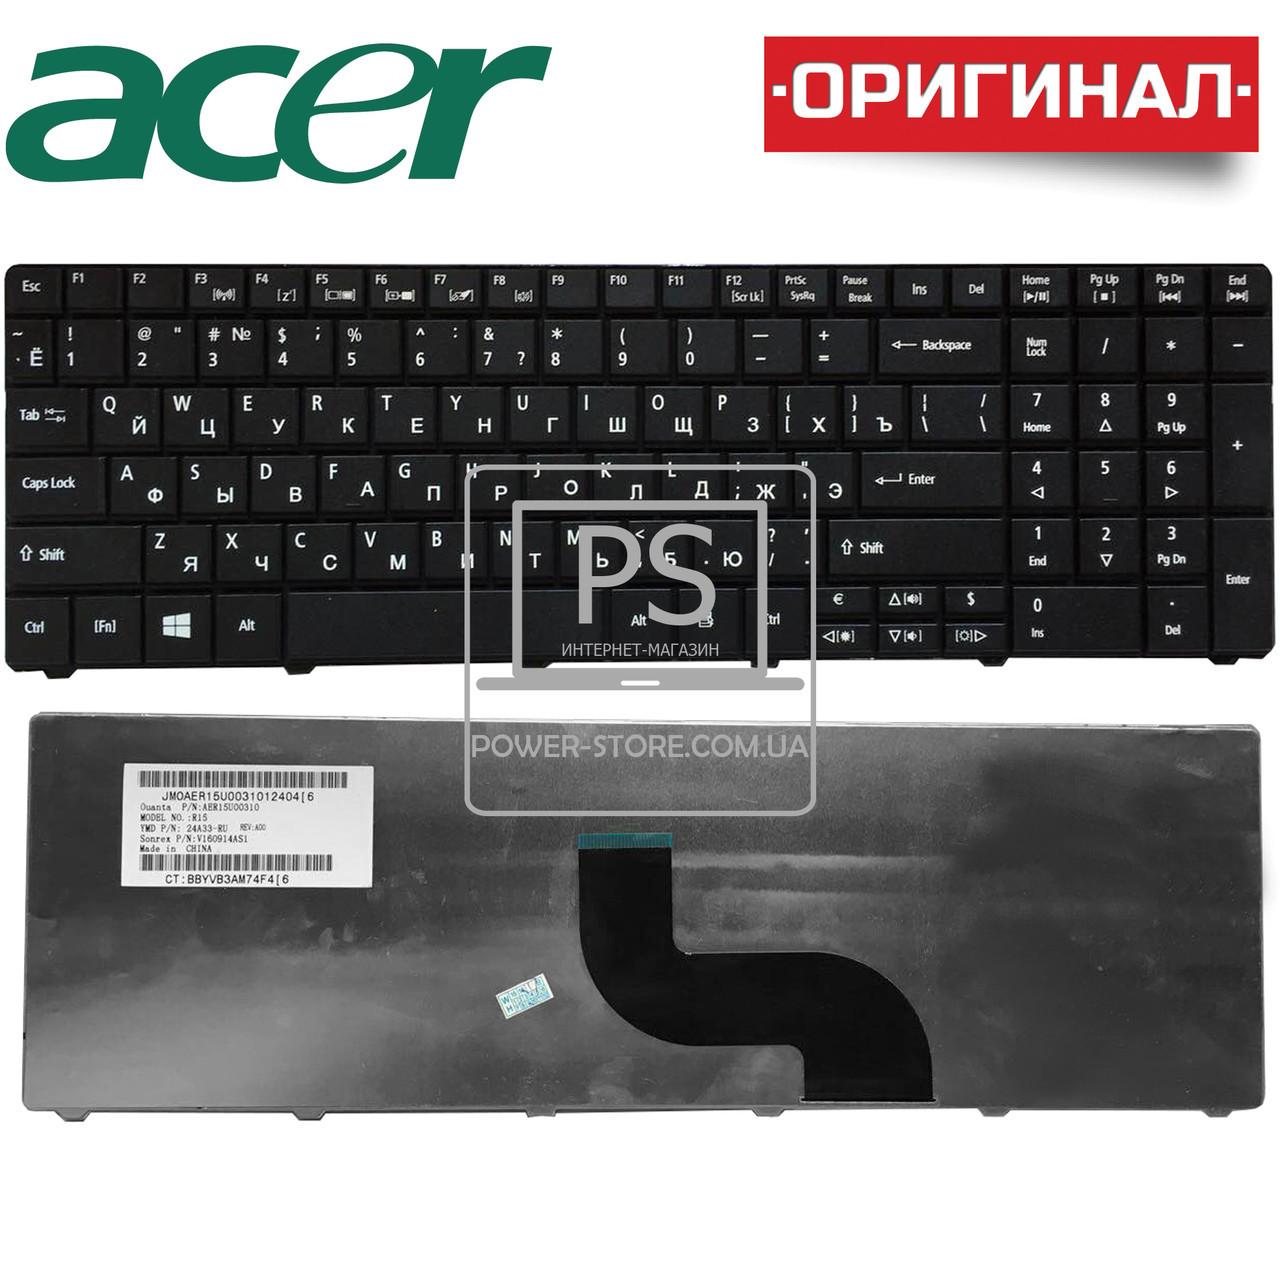 Клавиатура  для ноутбука ACER NK.I1717.006, NK.I1717.00T, NK.I1717.00V, NK.I1717.00W,